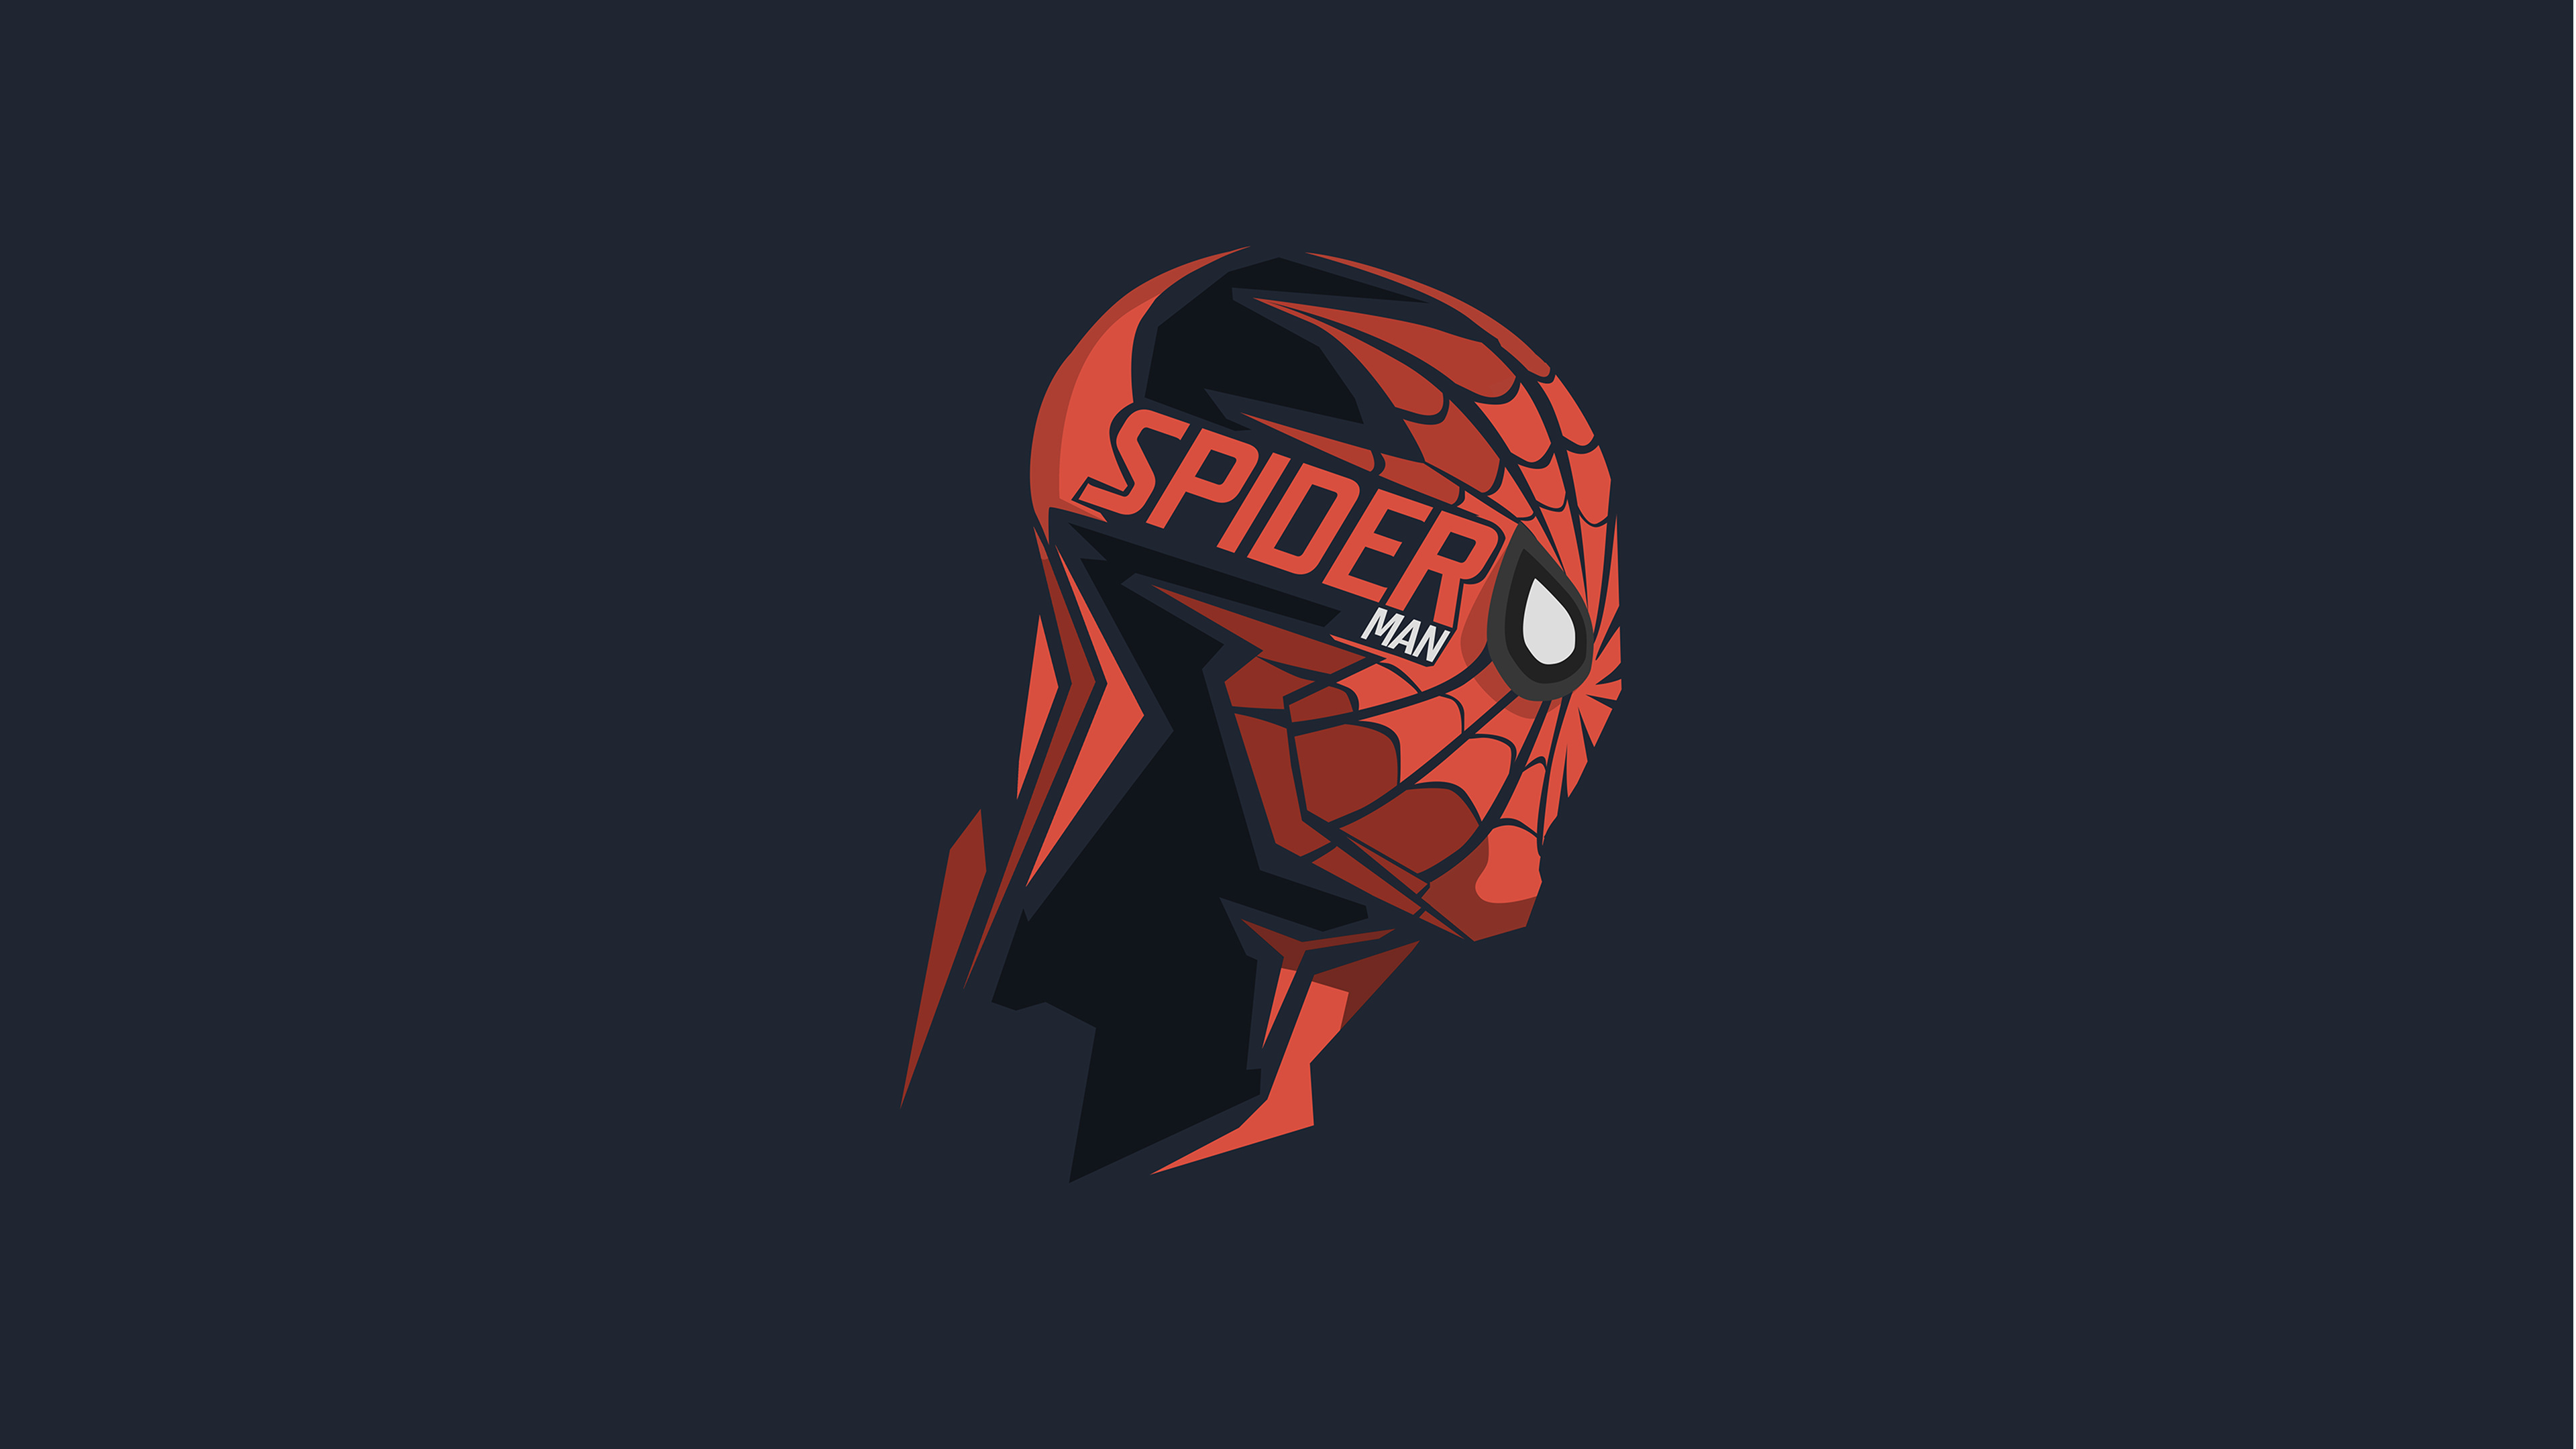 spiderman mask minimalism 8k 1536523599 - Spiderman Mask Minimalism 8k - superheroes wallpapers, spiderman wallpapers, minimalism wallpapers, hd-wallpapers, digital art wallpapers, artwork wallpapers, artstation wallpapers, artist wallpapers, 8k wallpapers, 5k wallpapers, 4k-wallpapers